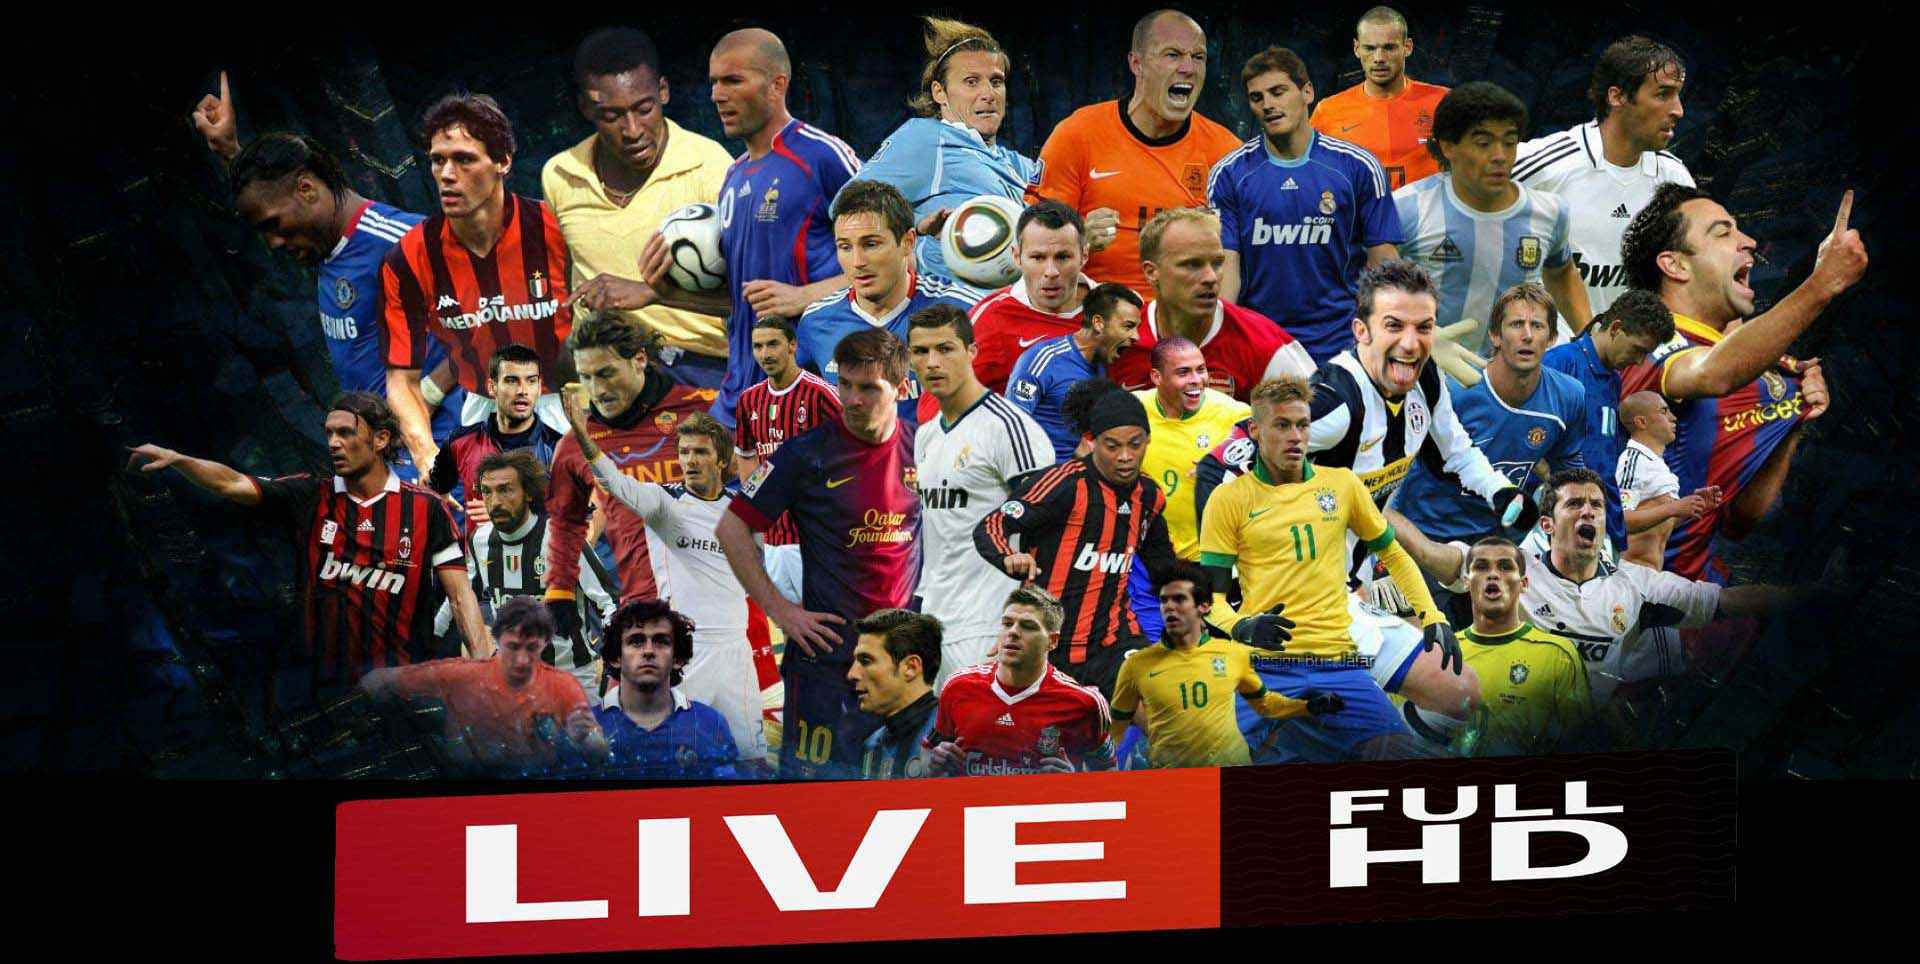 Real Madrid Vs Legia live